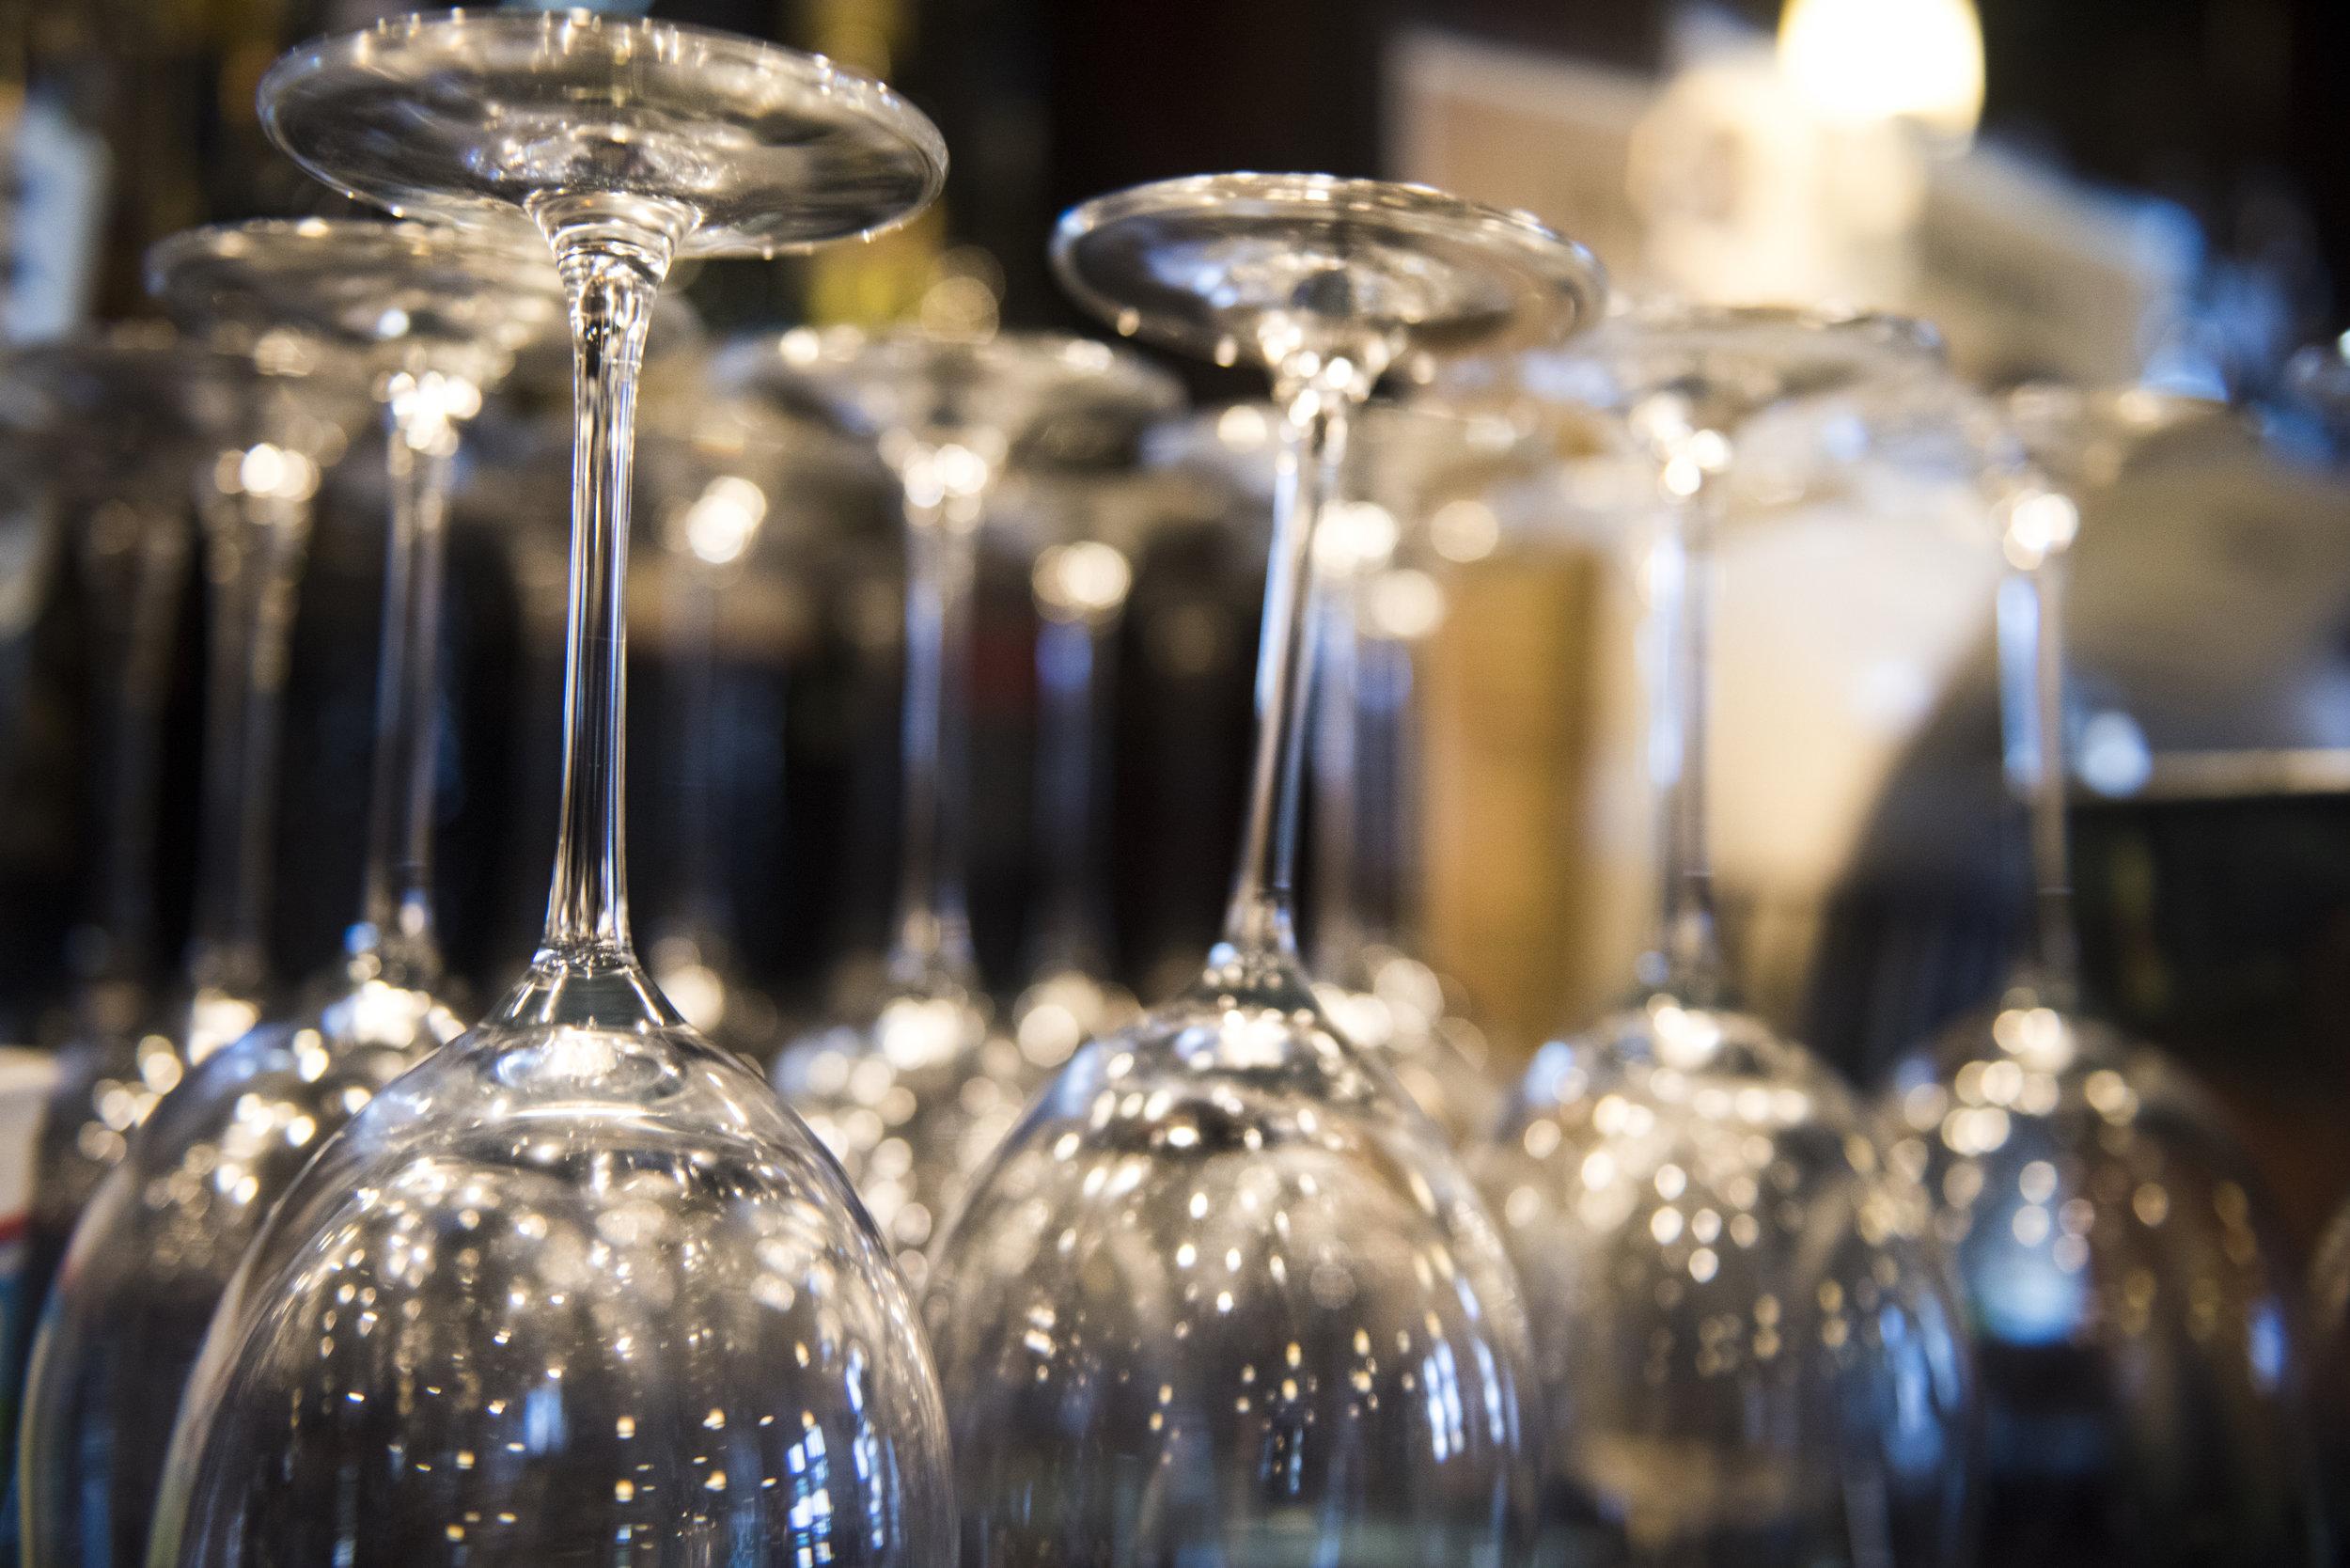 close-up-lines-upsidedown-wine-glasees.jpg